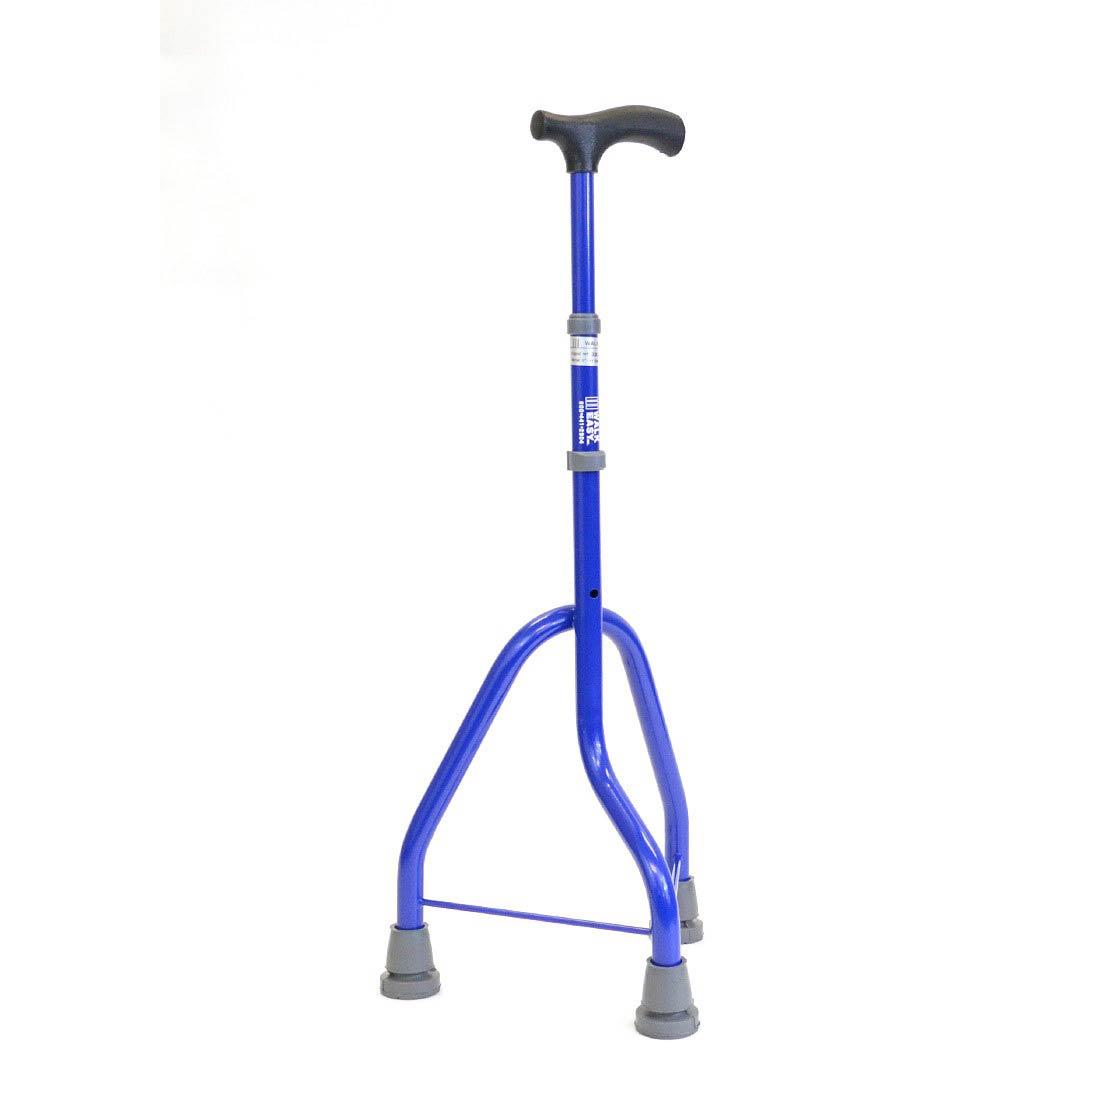 Walk Easy pediatric tripod straight neck cane